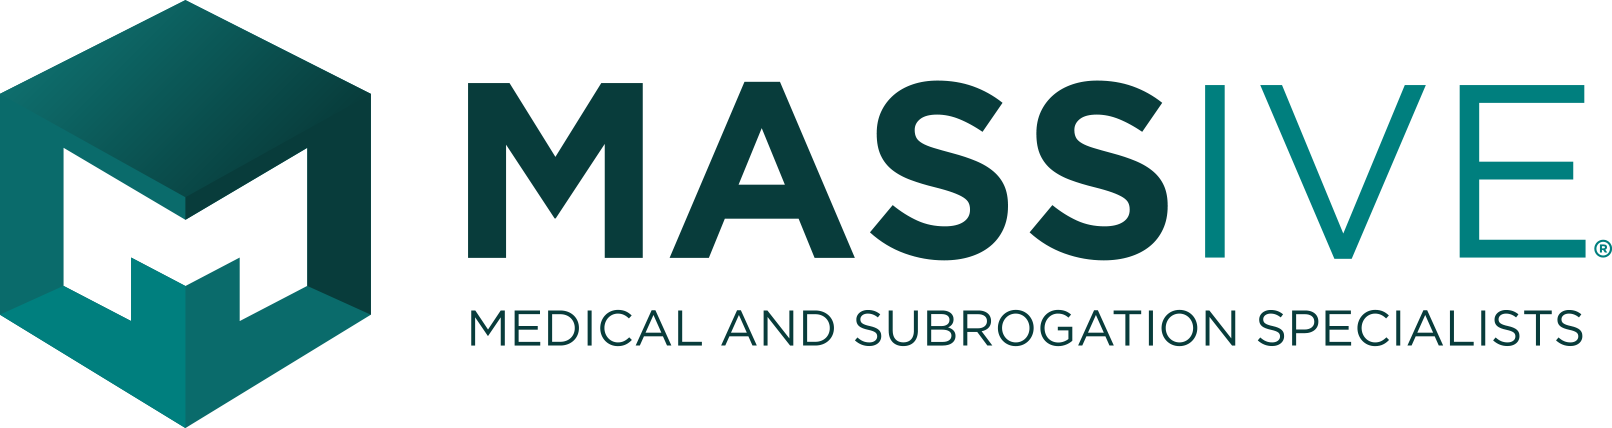 MASSive logo horizontal